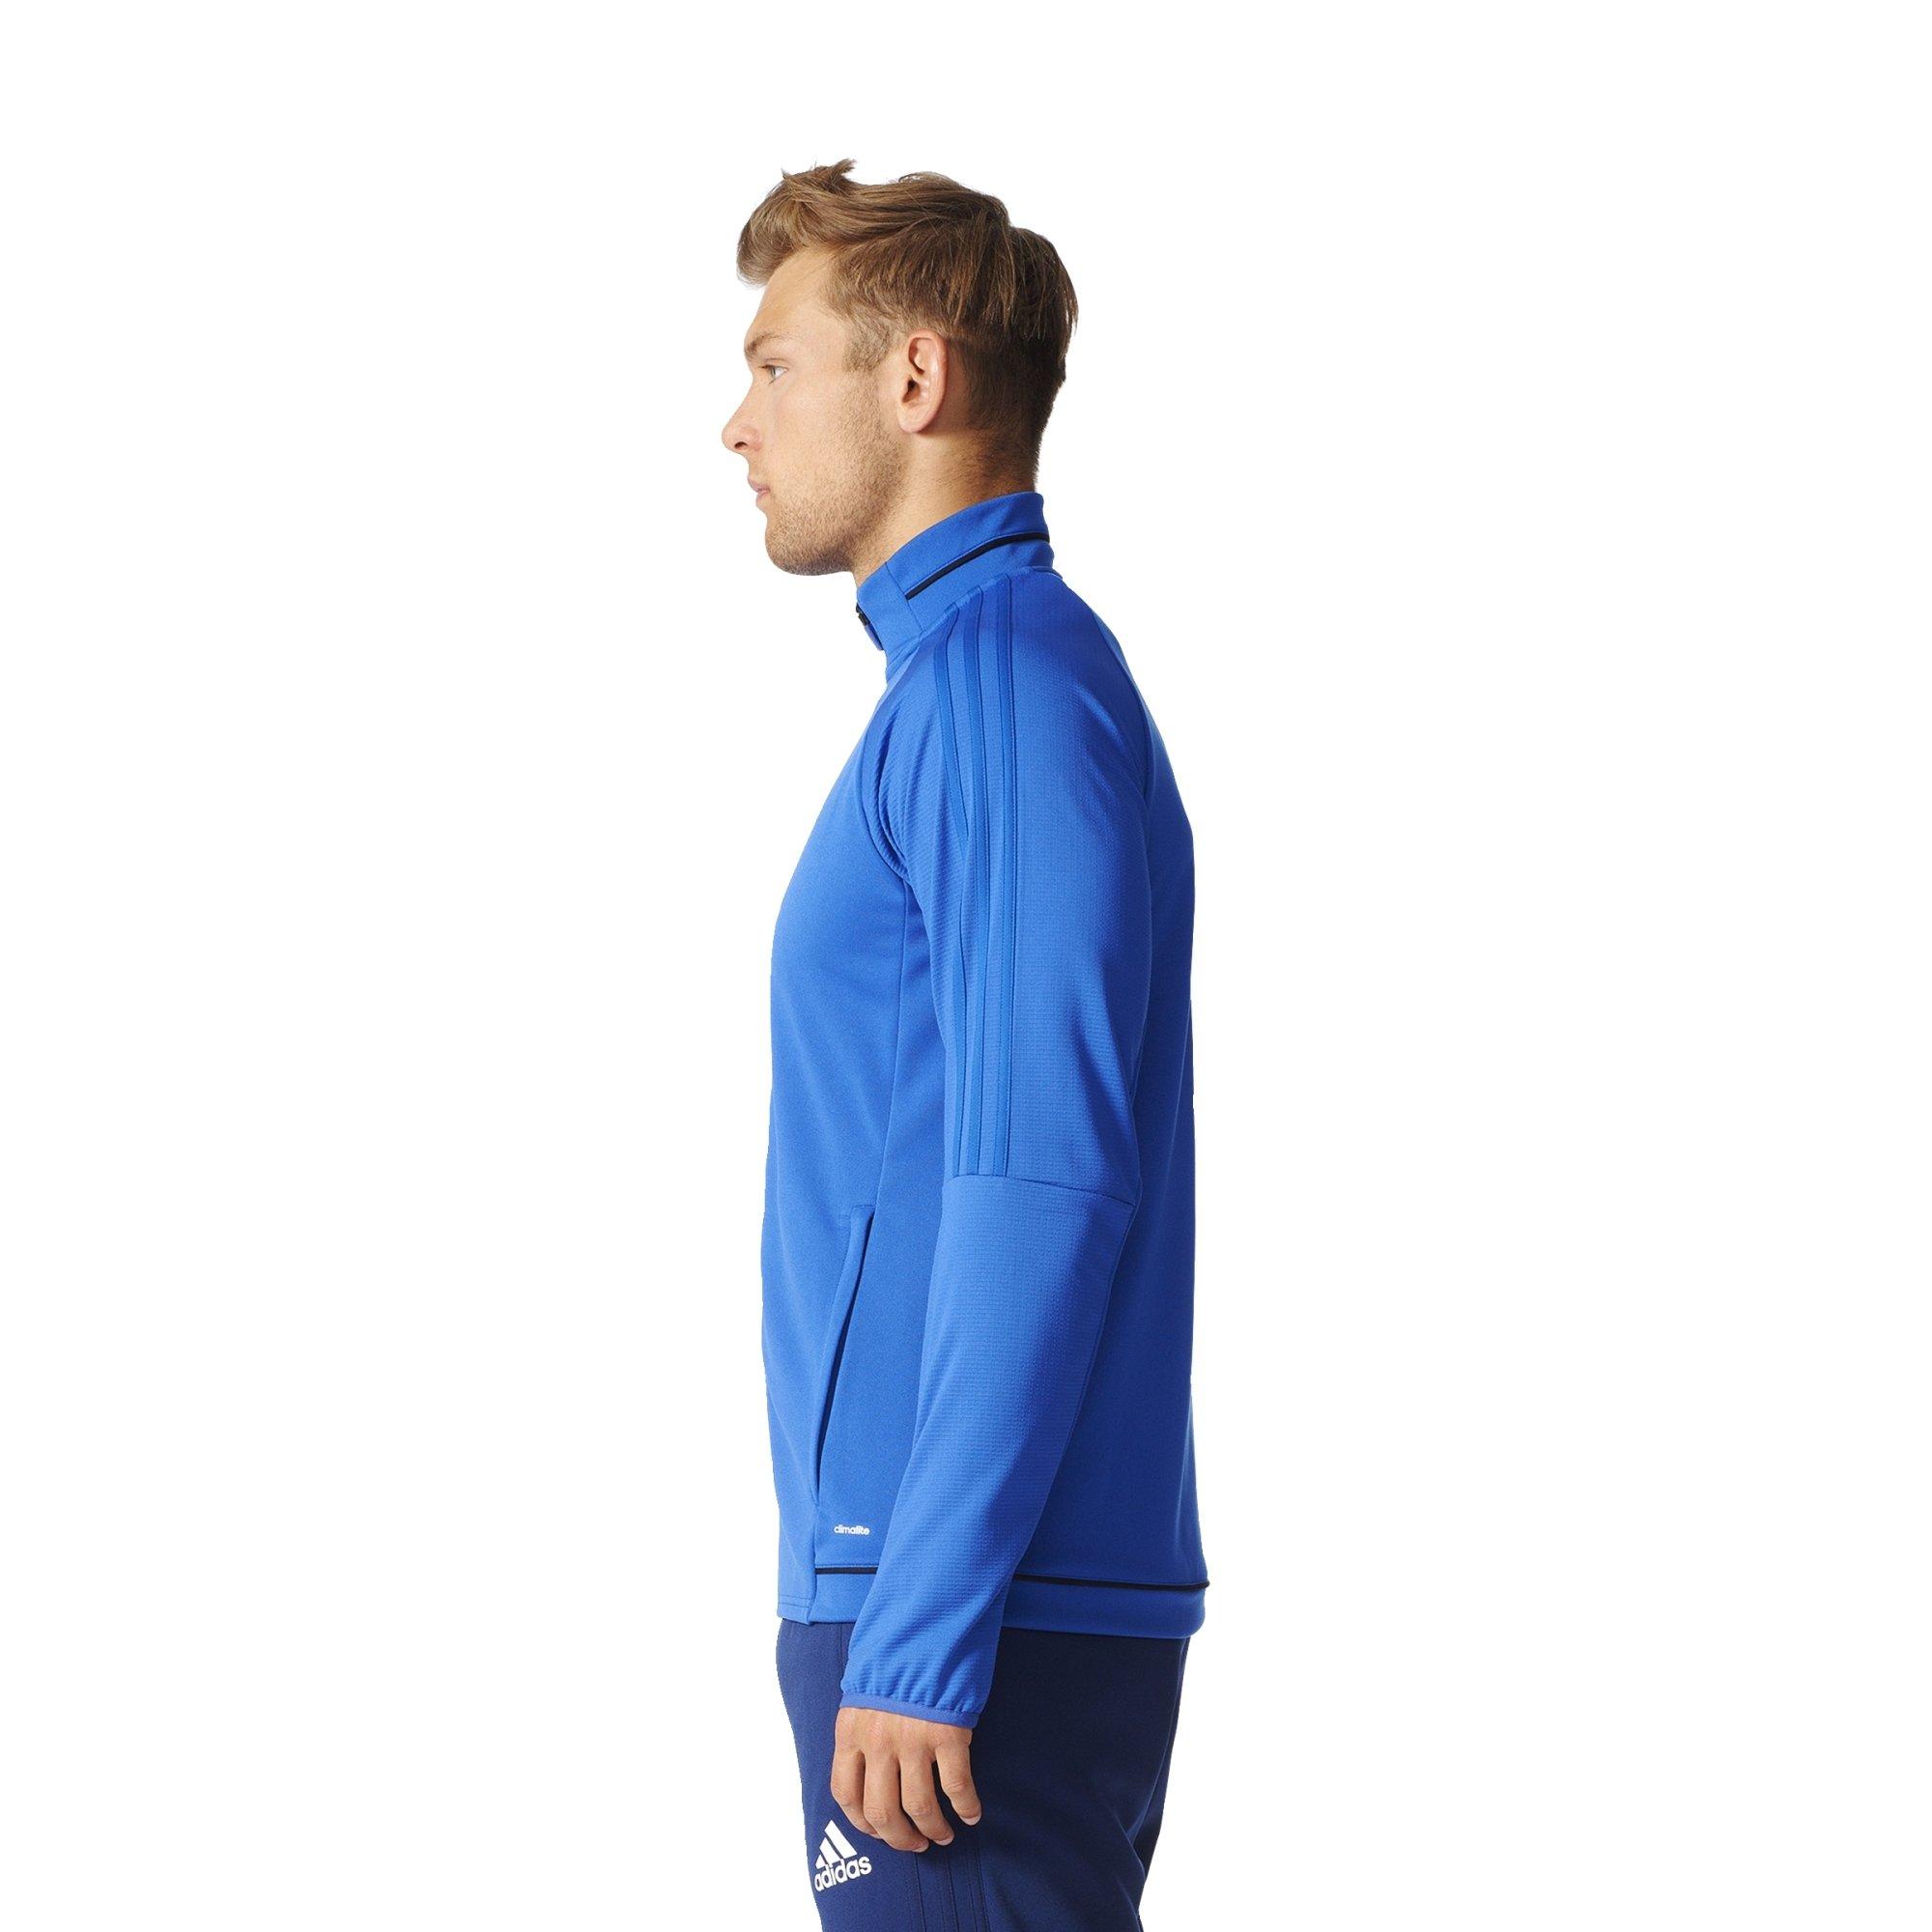 25f944c201ae Adidas Tiro 17 Mens Soccer Training Jacket L Bold Blue-Black-White - BQ8201    Soccer   Sports   Outdoors - tibs